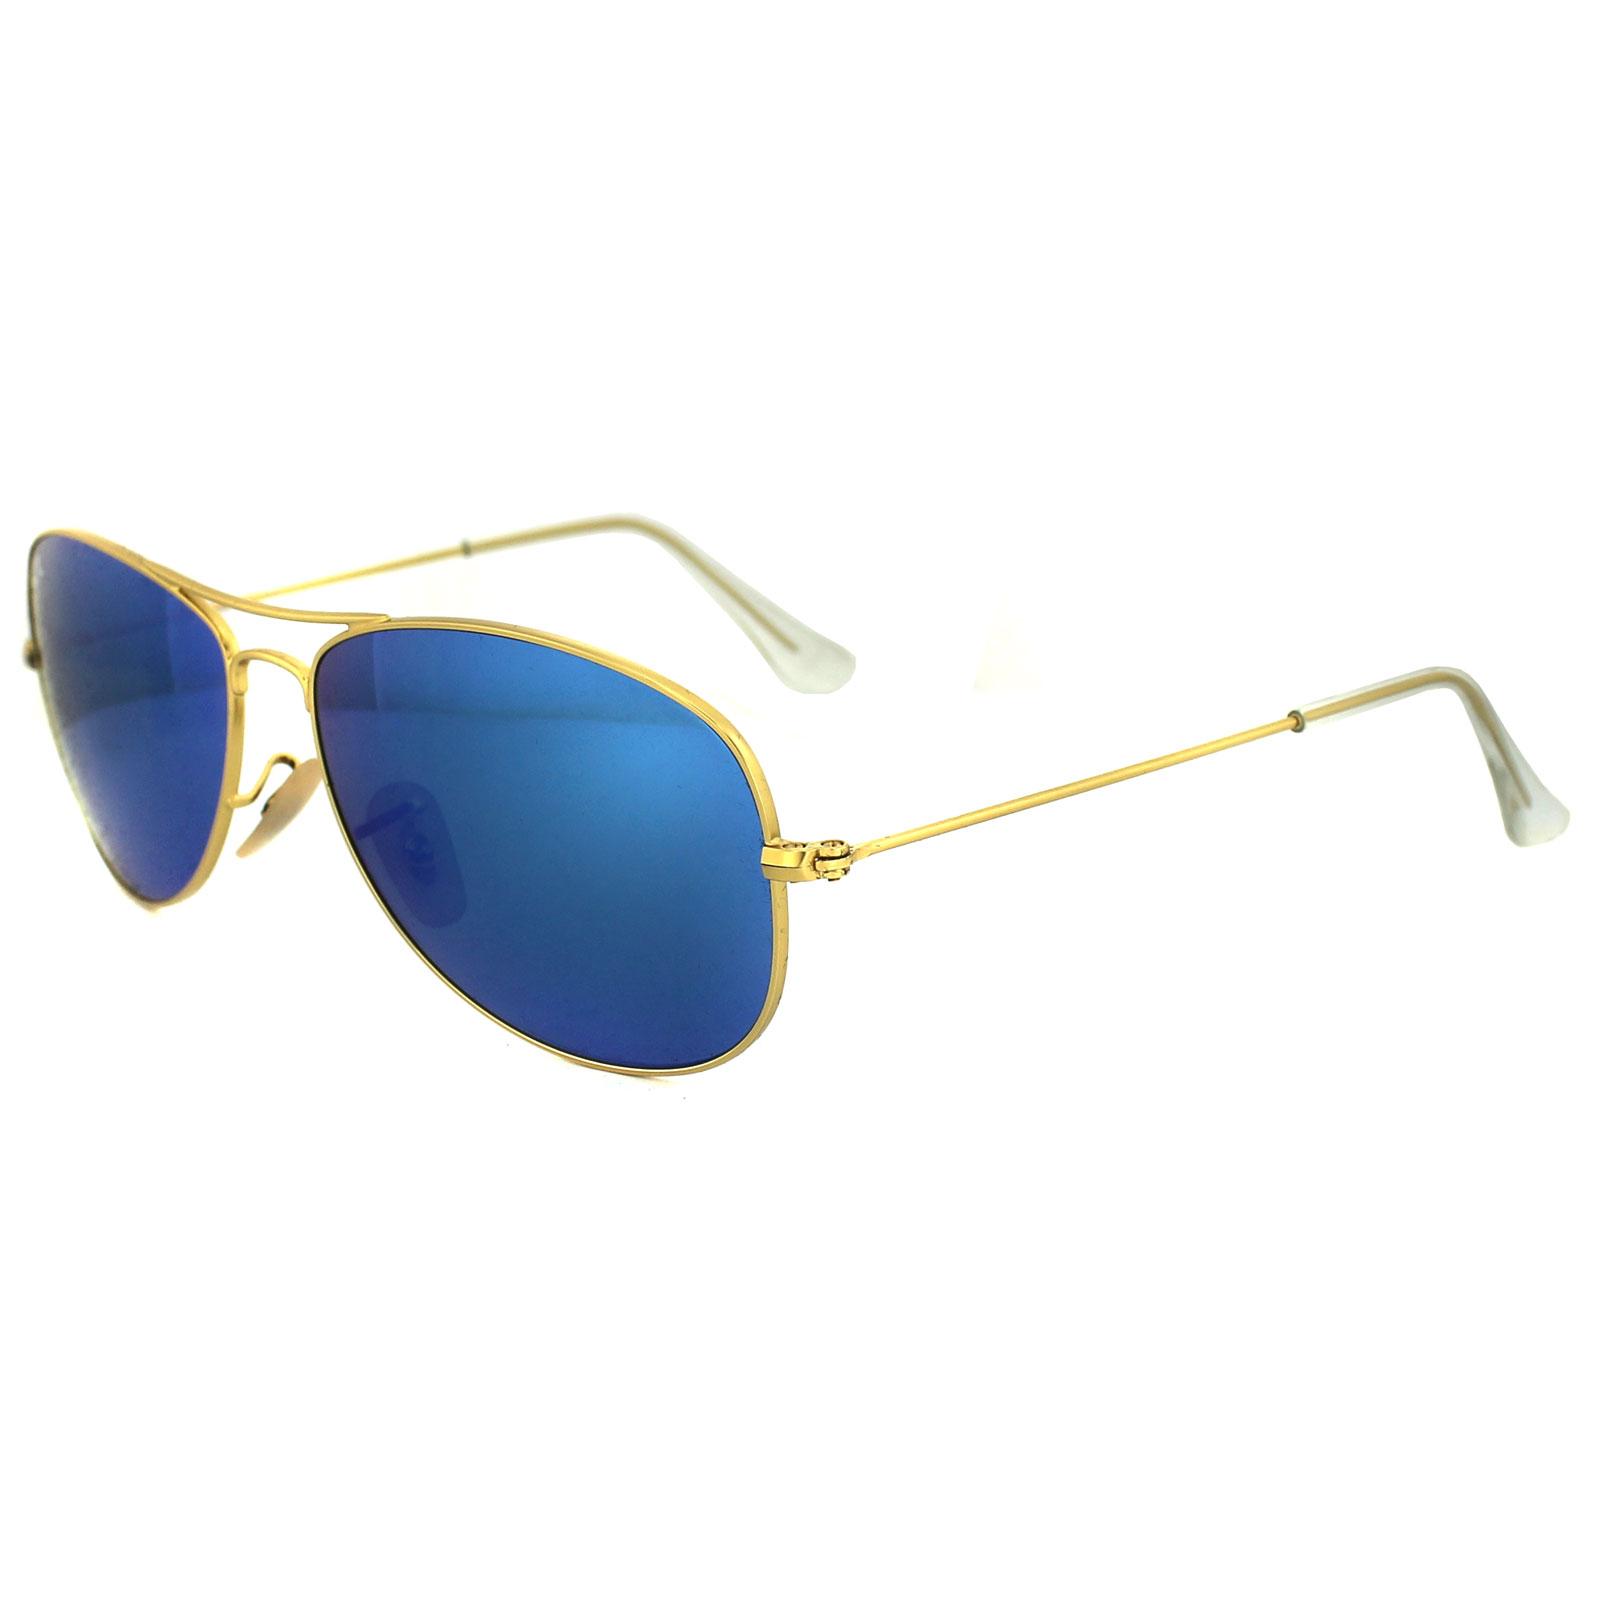 ray ban lunettes de soleil cockpit 3362 112 17 dor matte mirroir bleue ebay. Black Bedroom Furniture Sets. Home Design Ideas